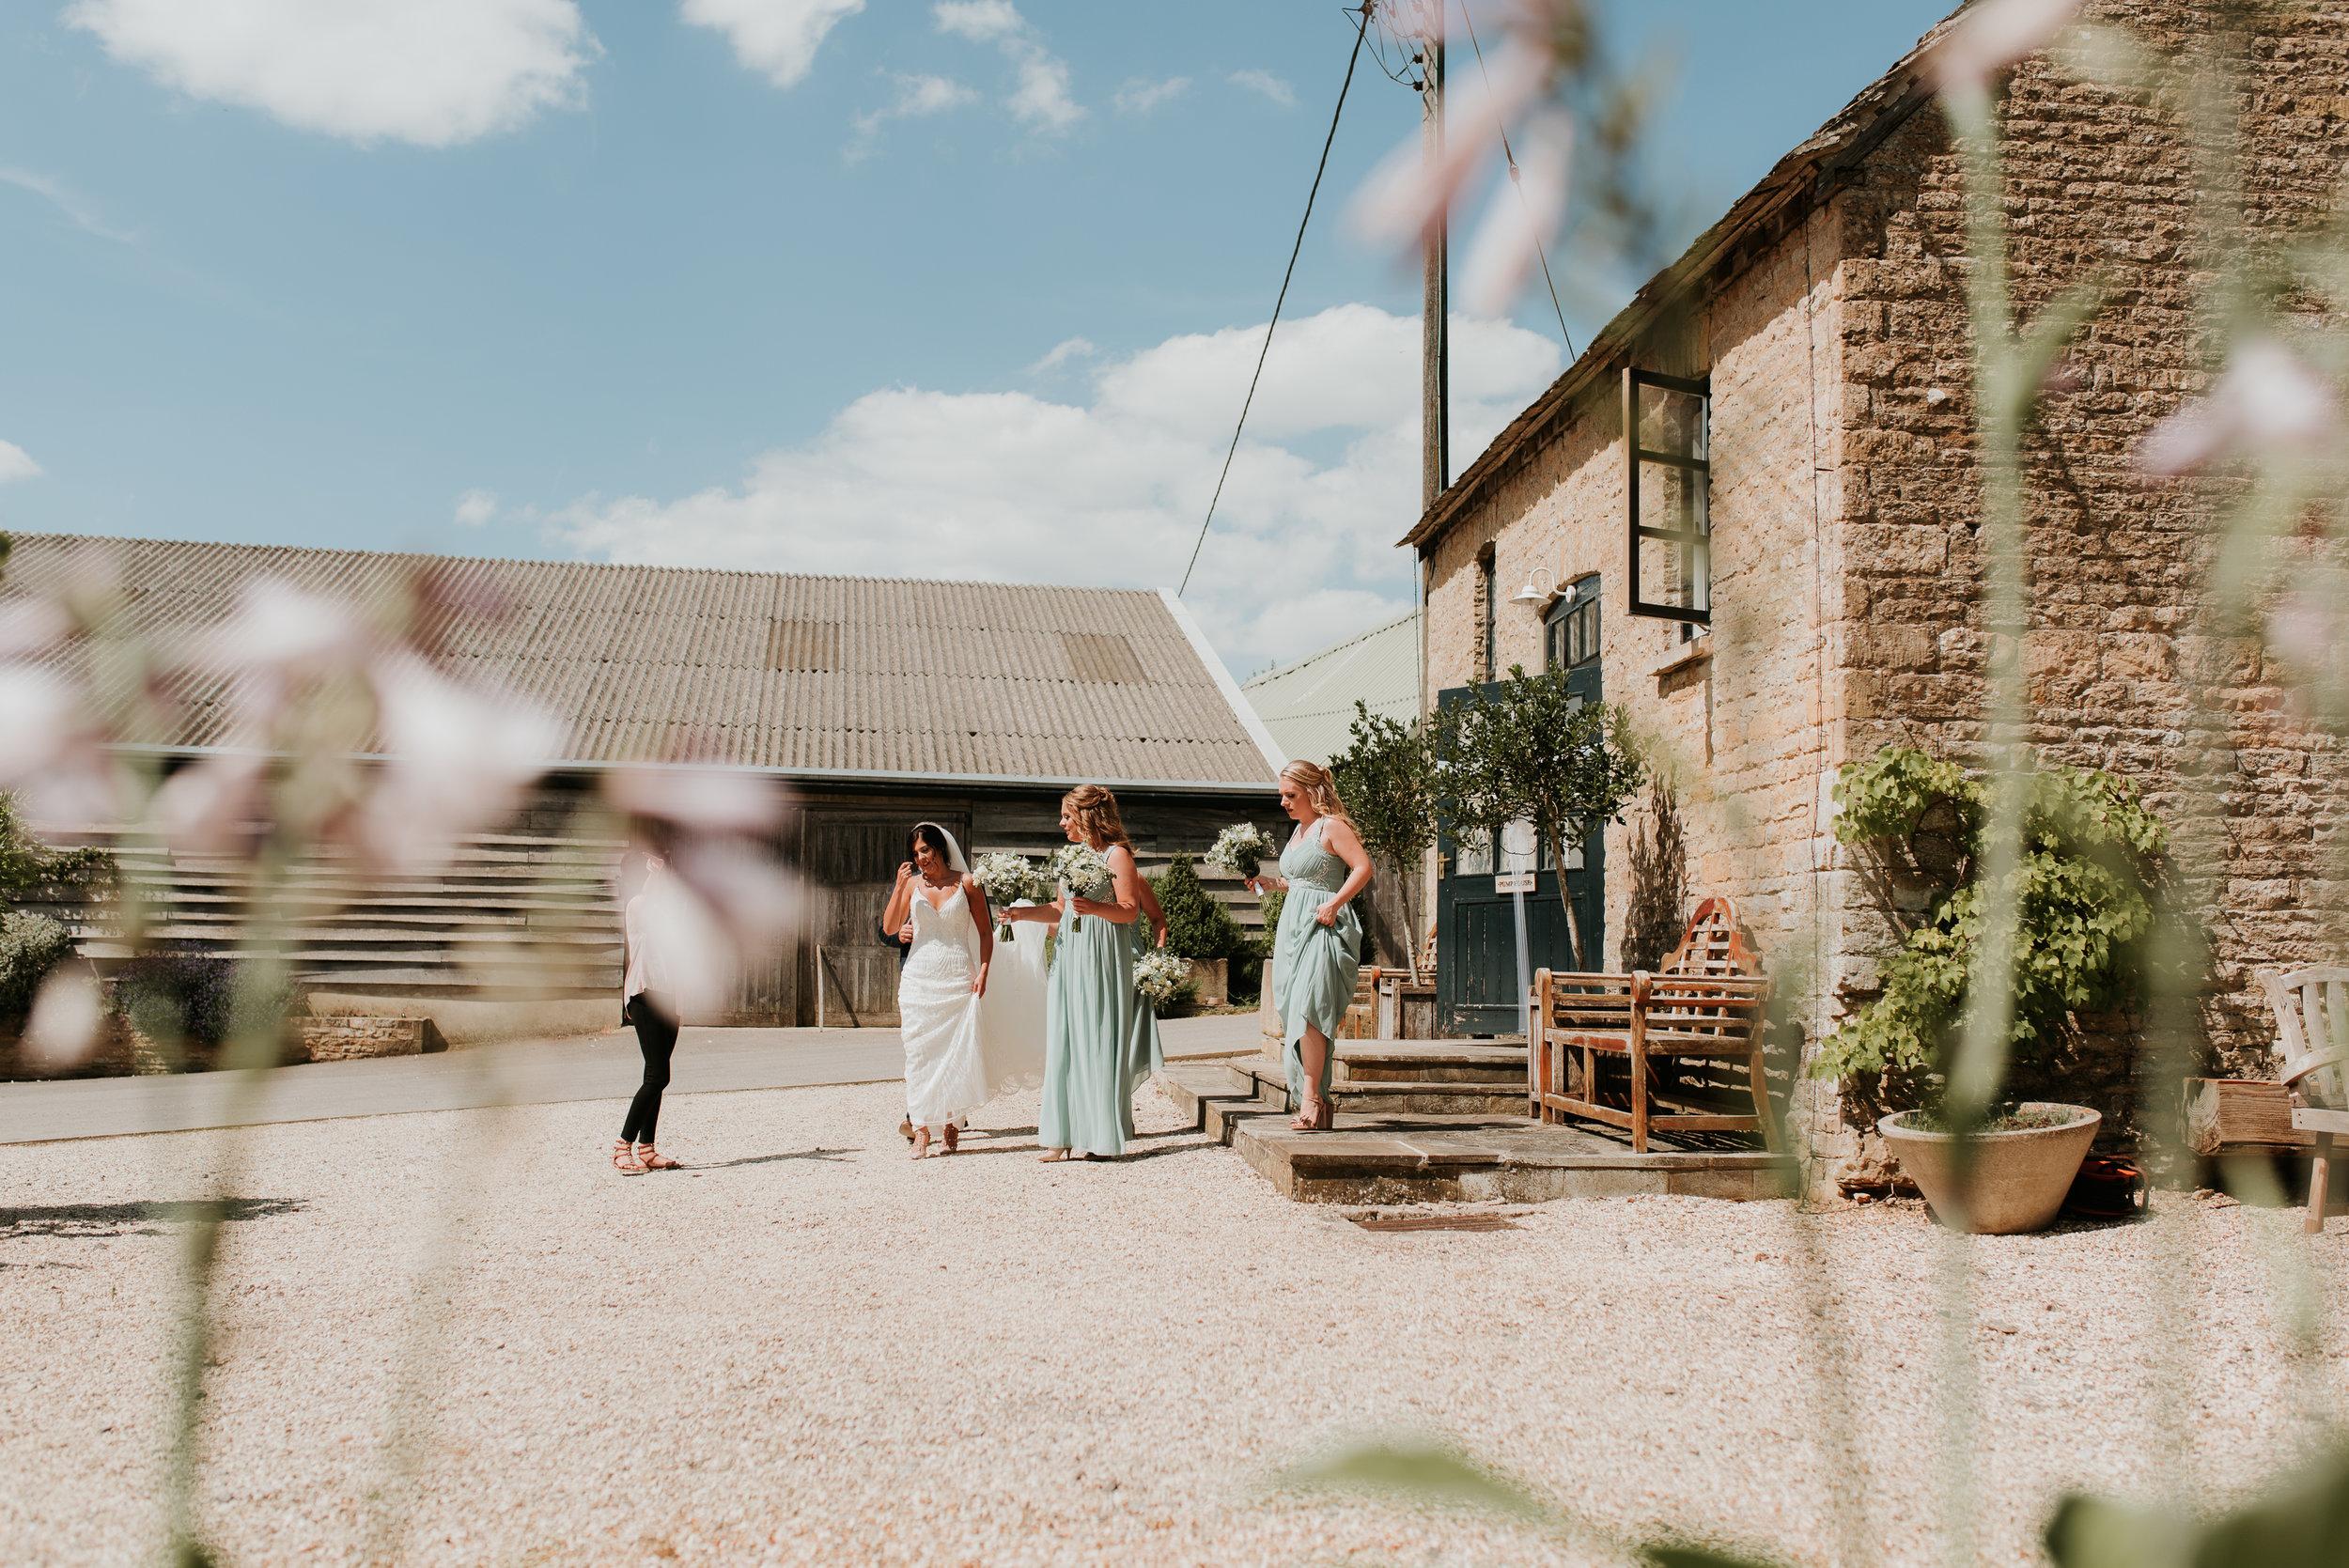 Oxfordshire-wedding-photographer-30.jpg